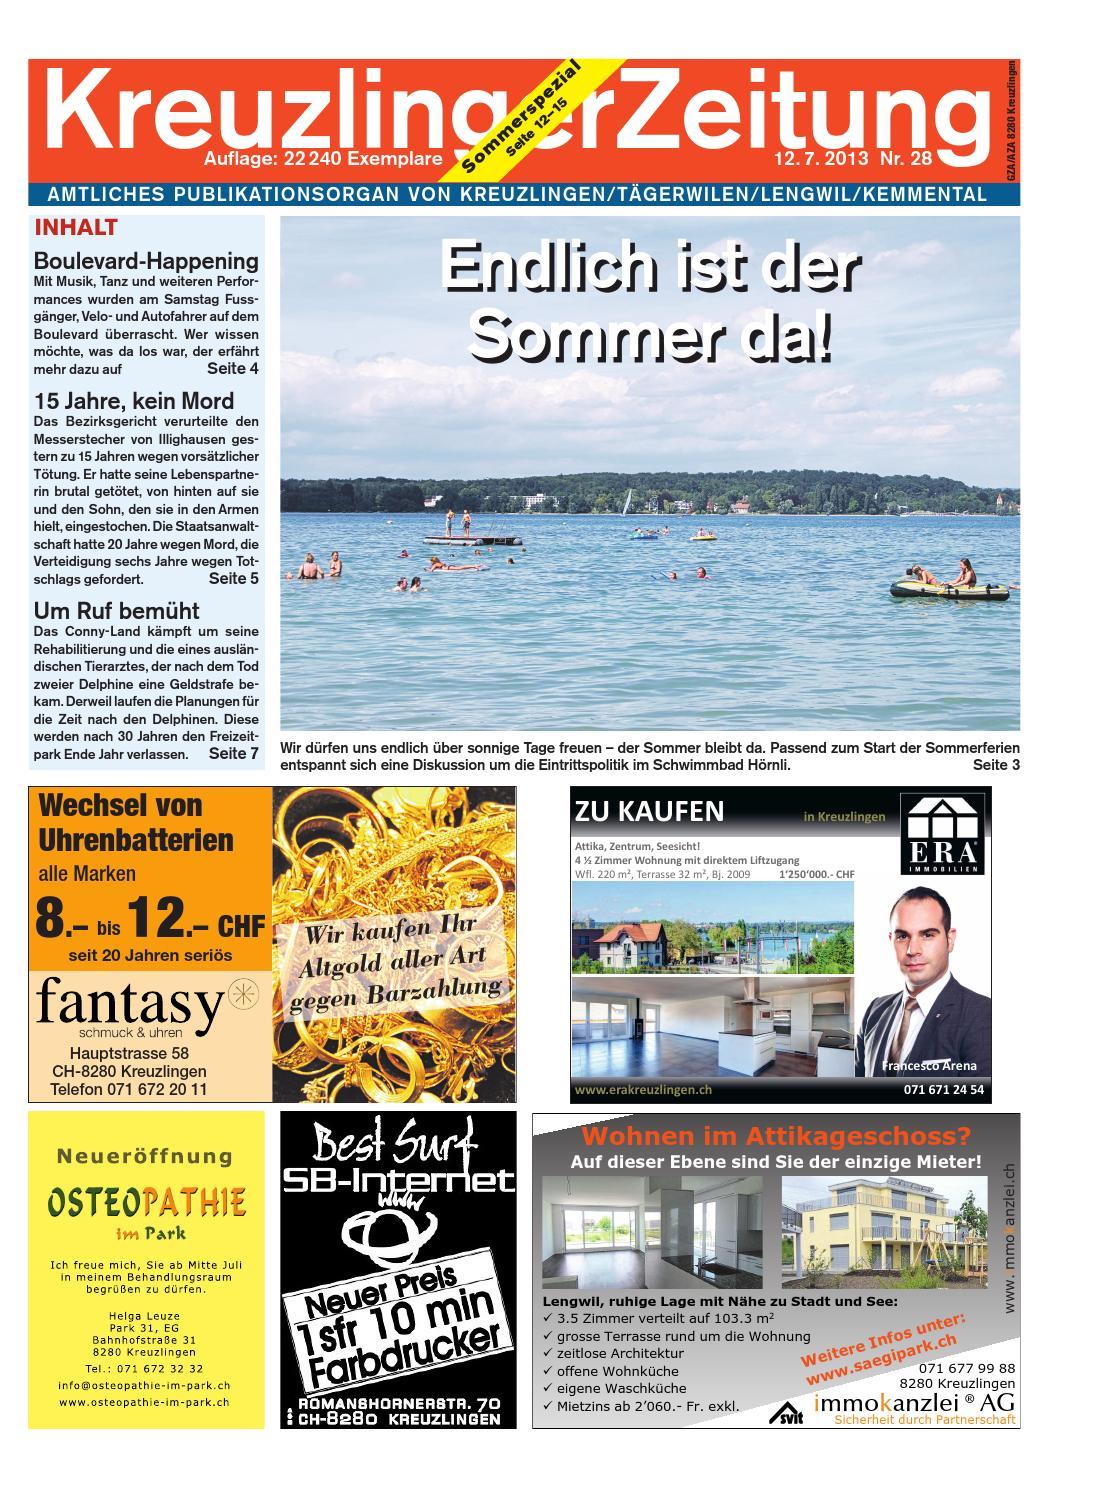 Juni 2008 Herausgeber: Ortsverein Seen 36. Jahrgang/Nr